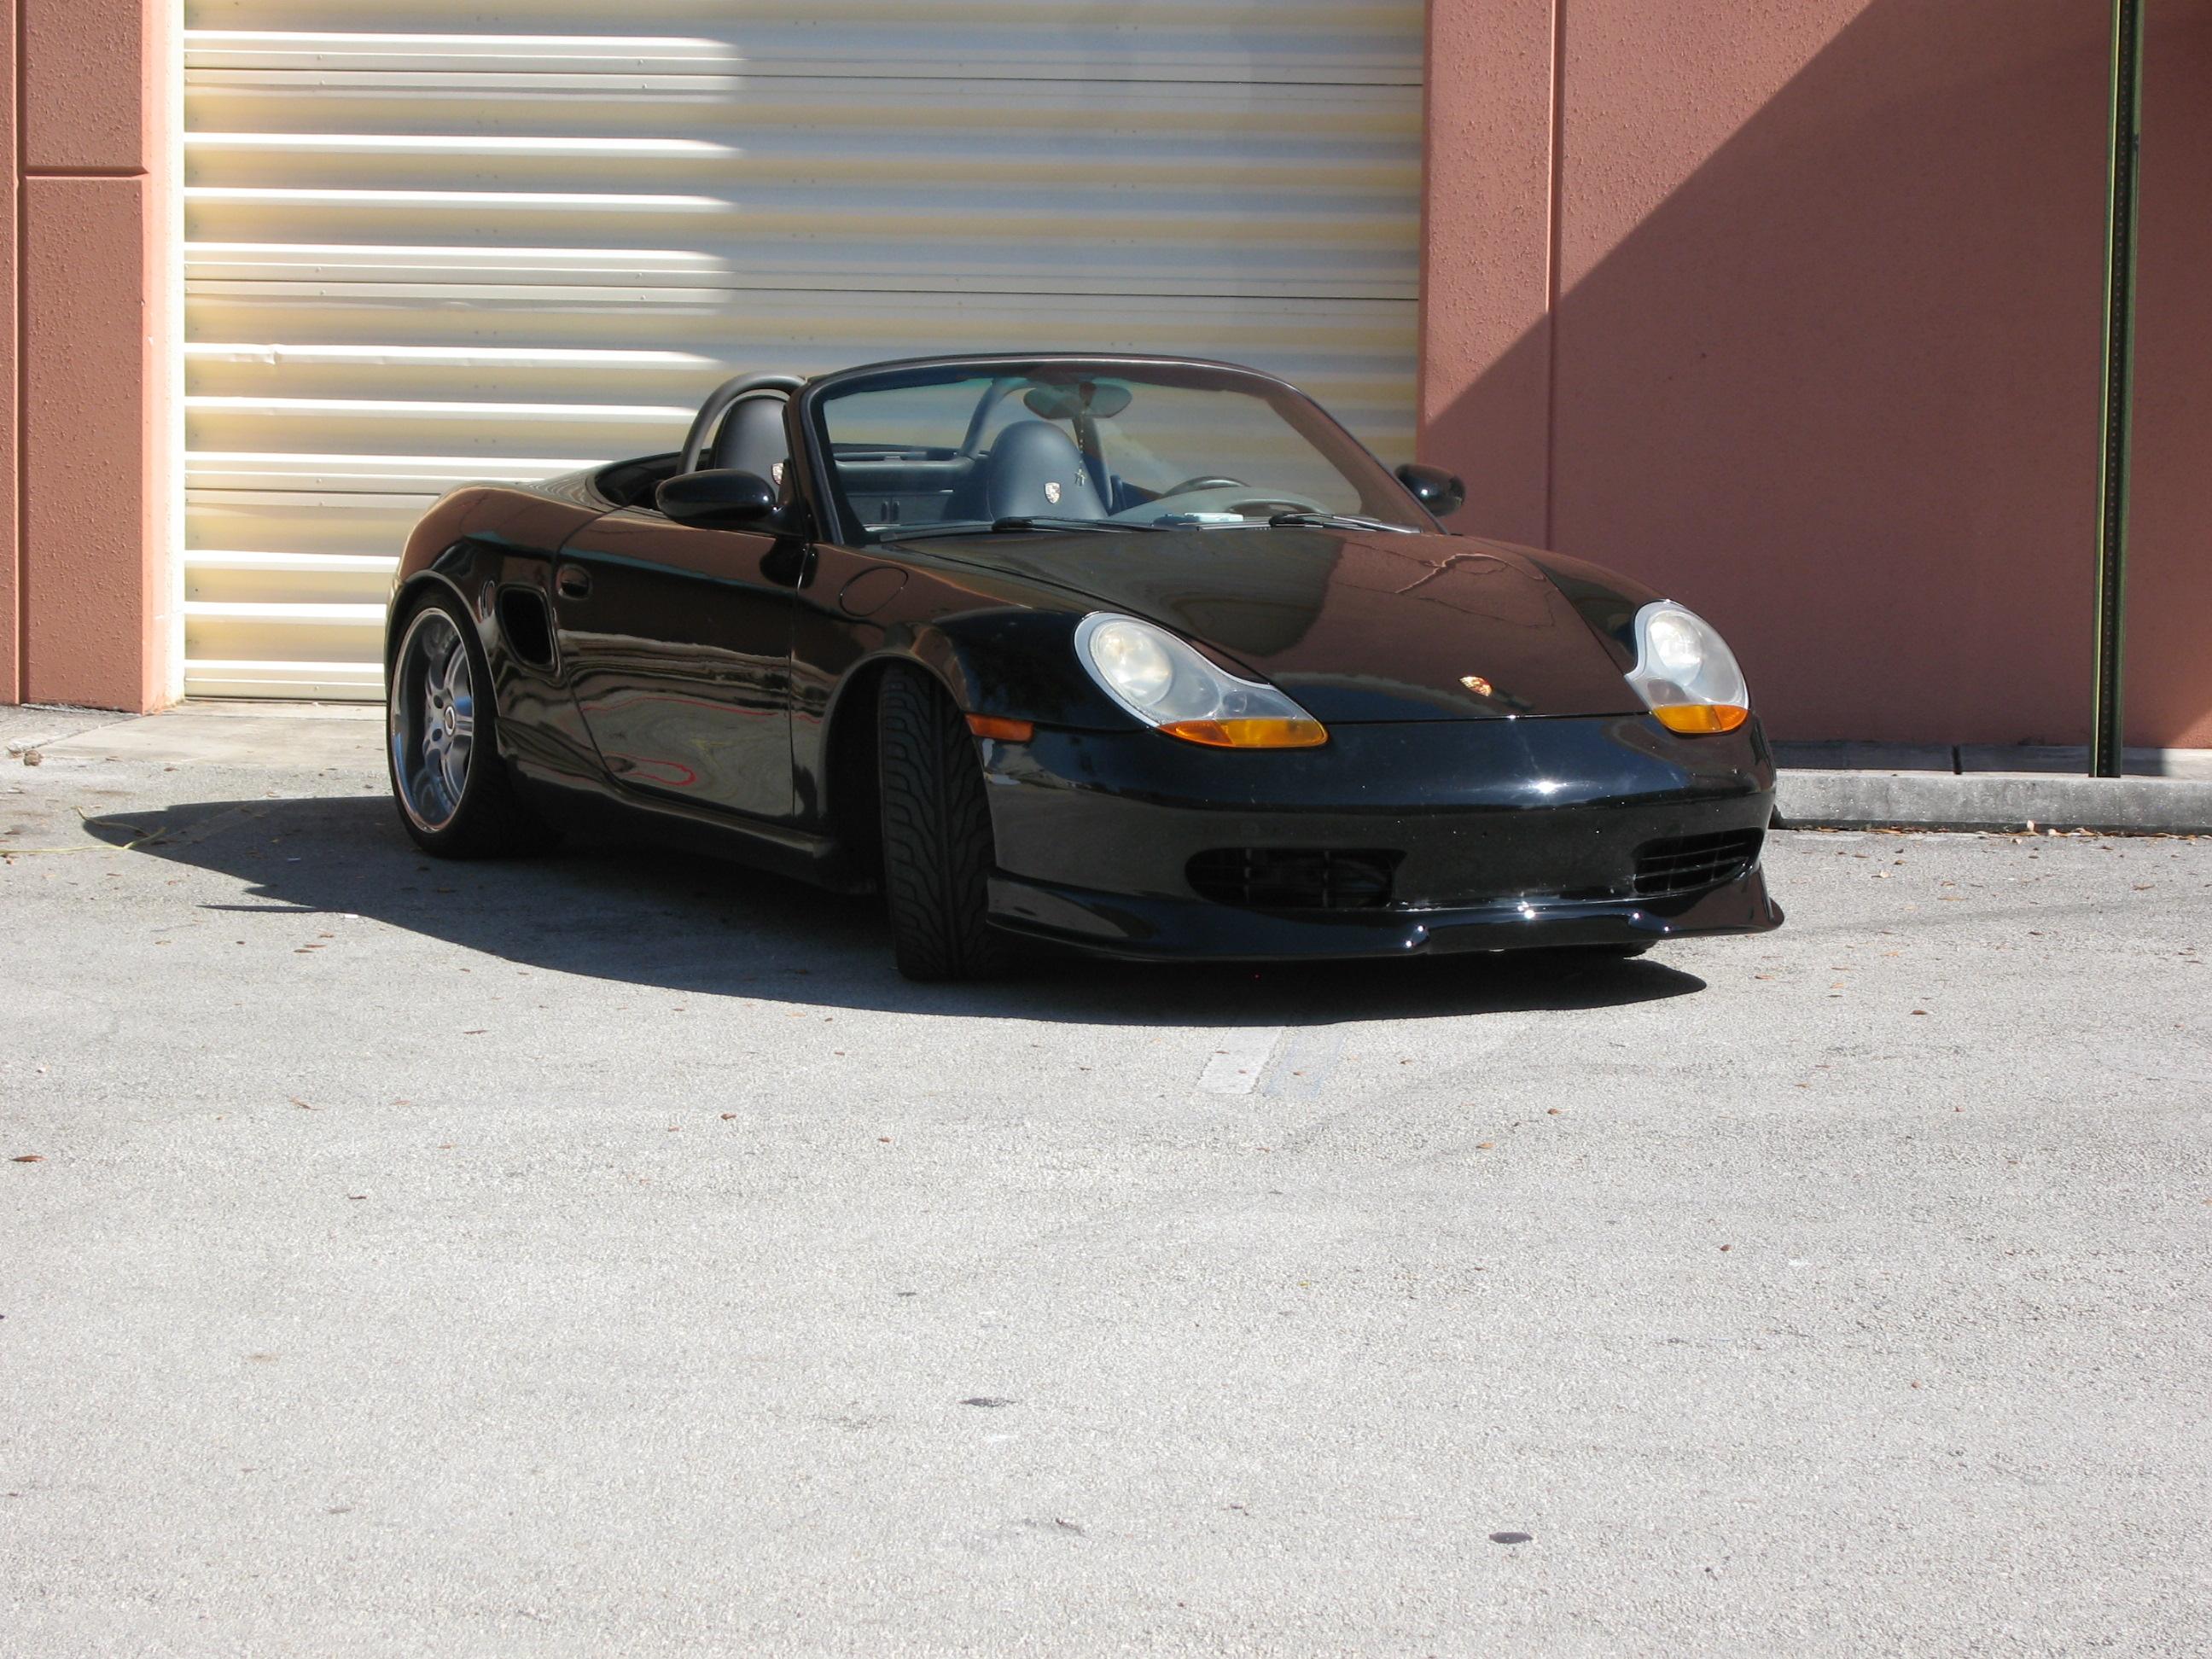 2001 Porsche Boxster Code Scanner – HD Wallpapers